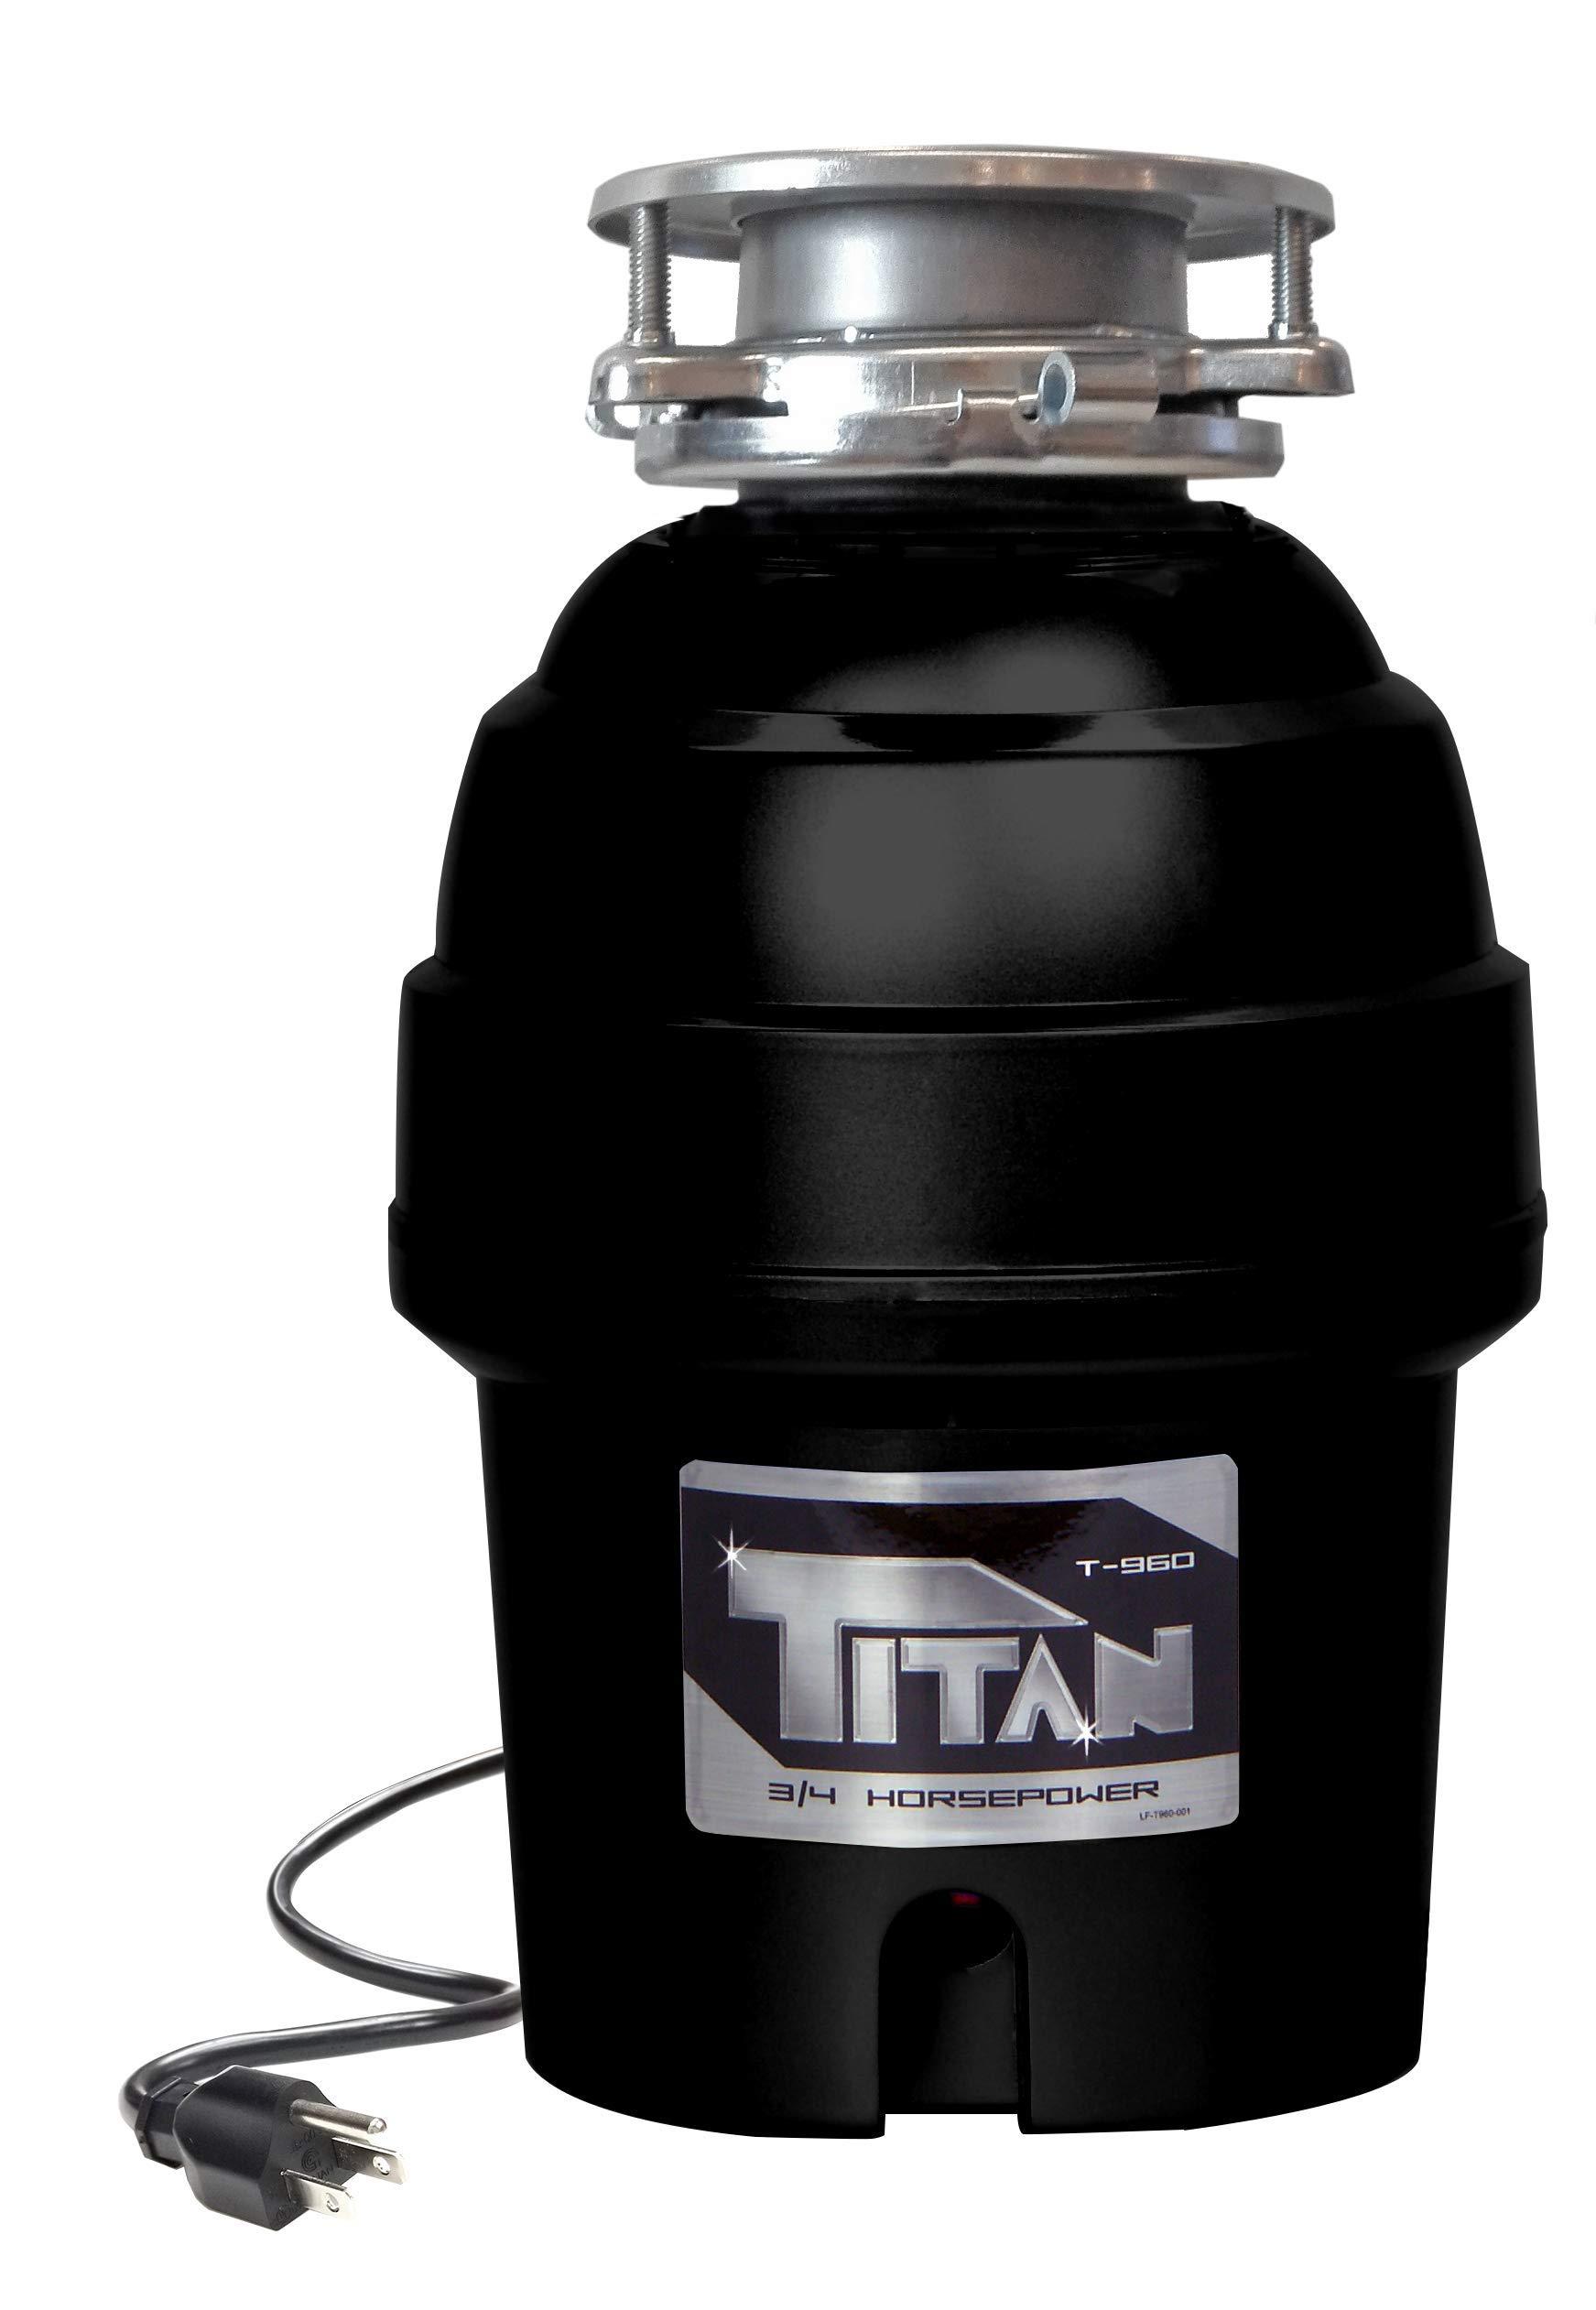 TITAN US-TN-T-960 T-960 Waste Disposer, 3/4 HP - Deluxe, Silver